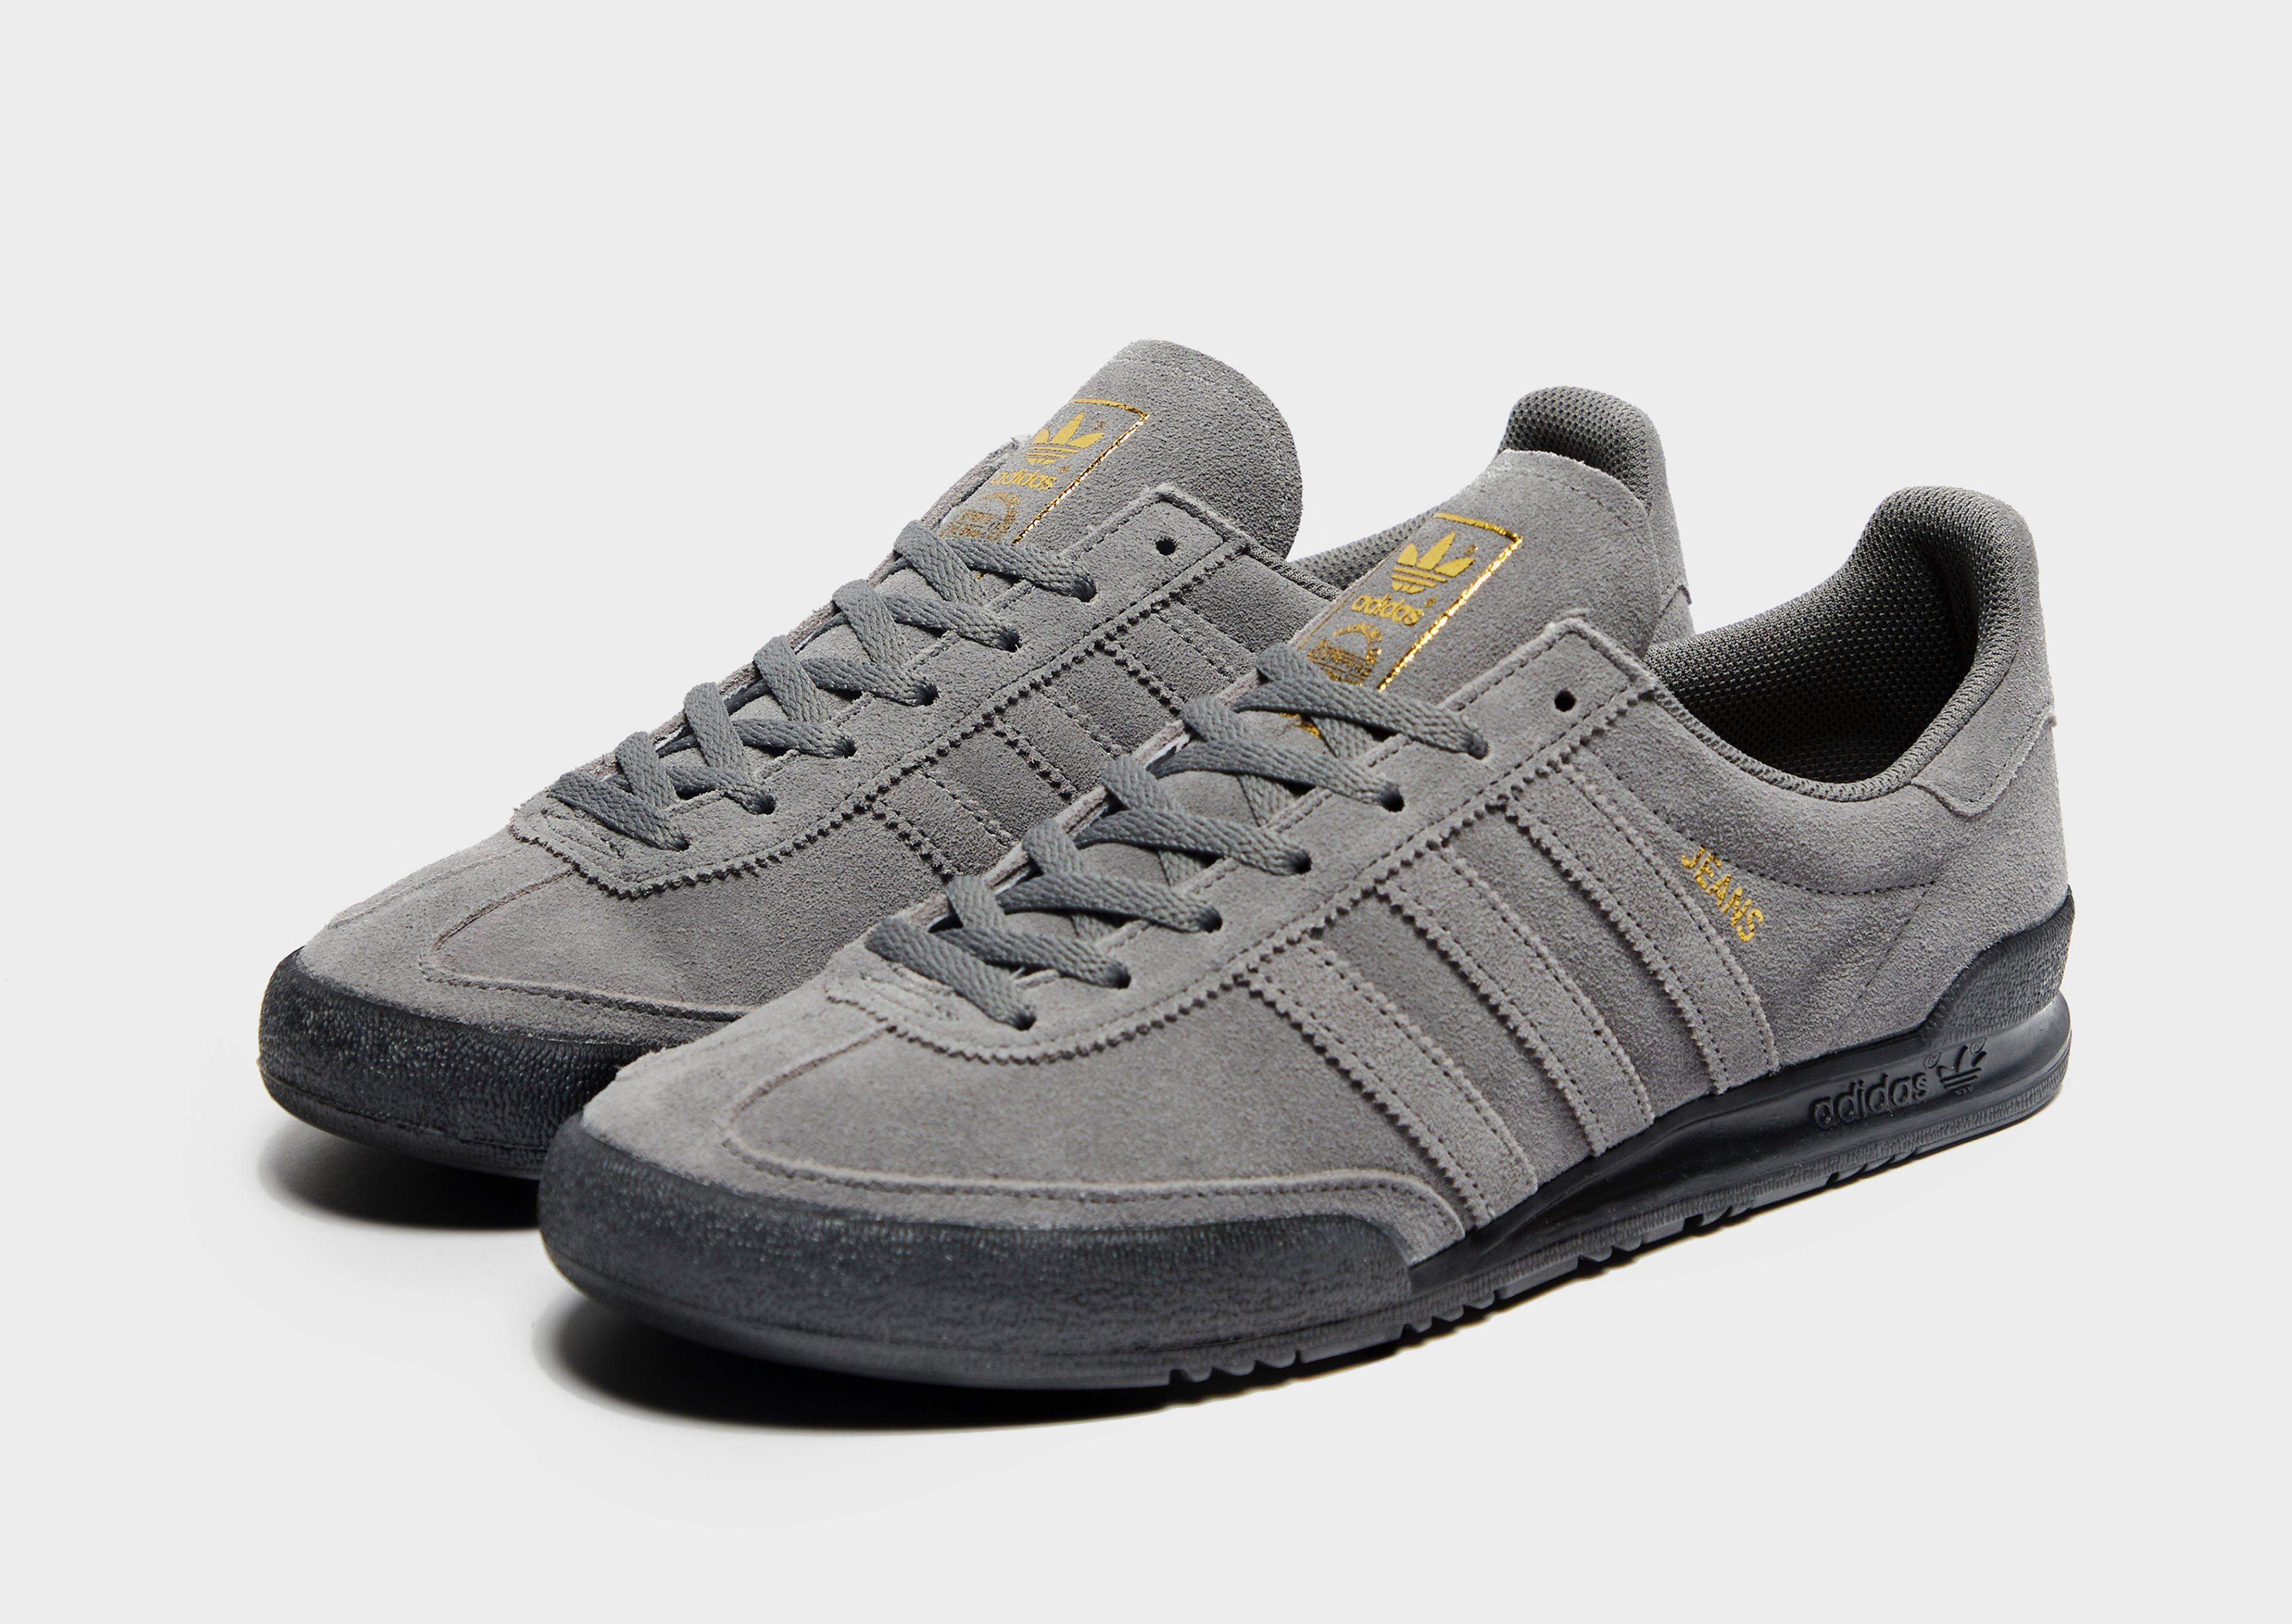 Details about BNWB & Genuine adidas originals ® Spezial Grey Orange Suede Trainers UK Size 10